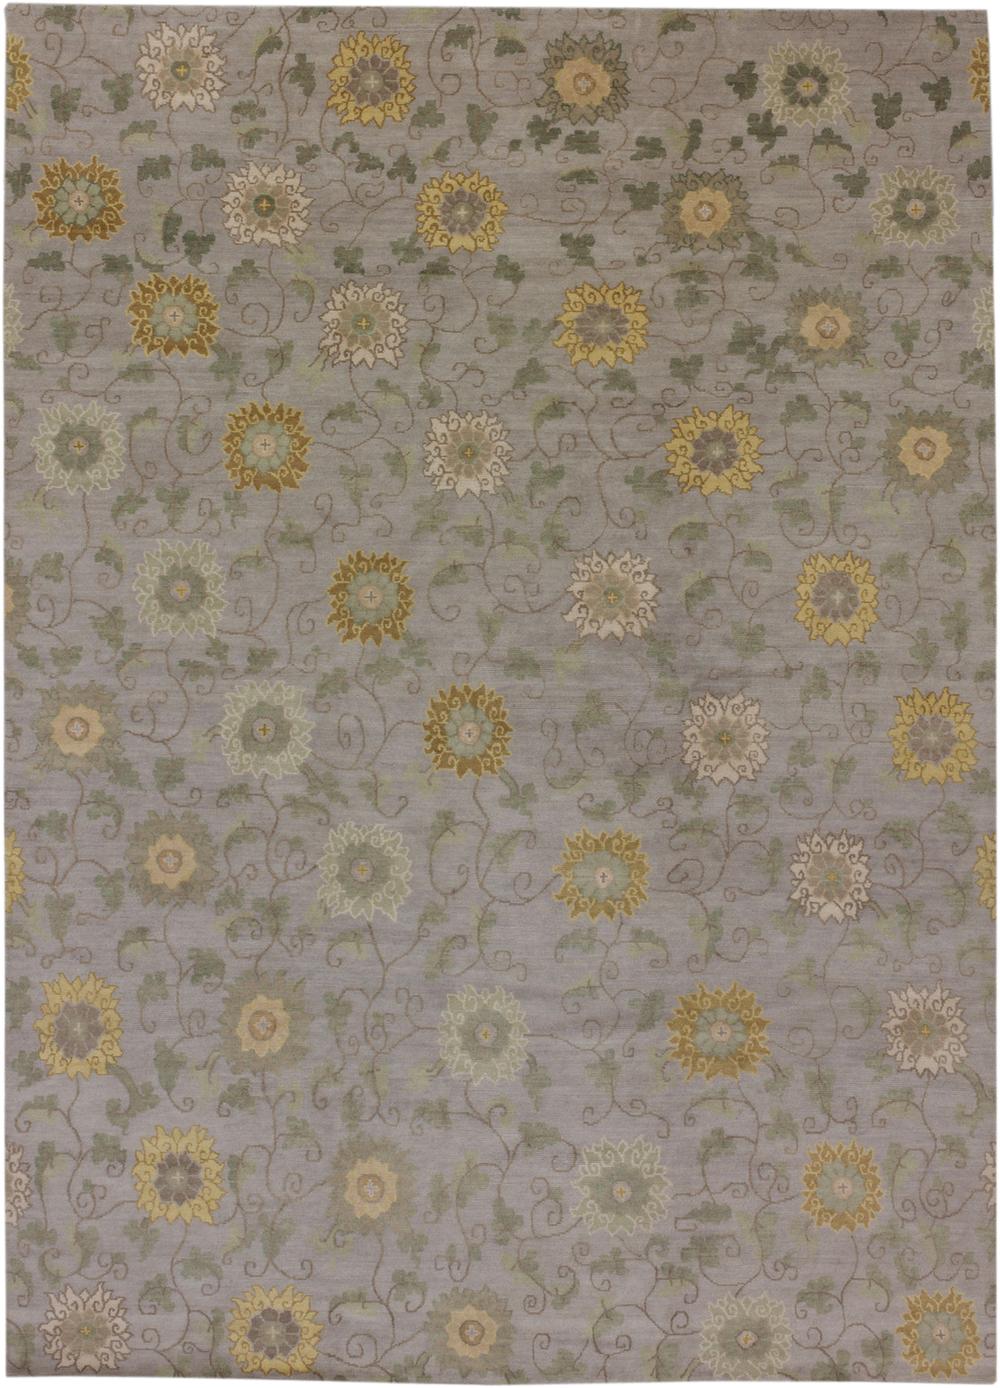 BigChrysanthemum_t1.jpg